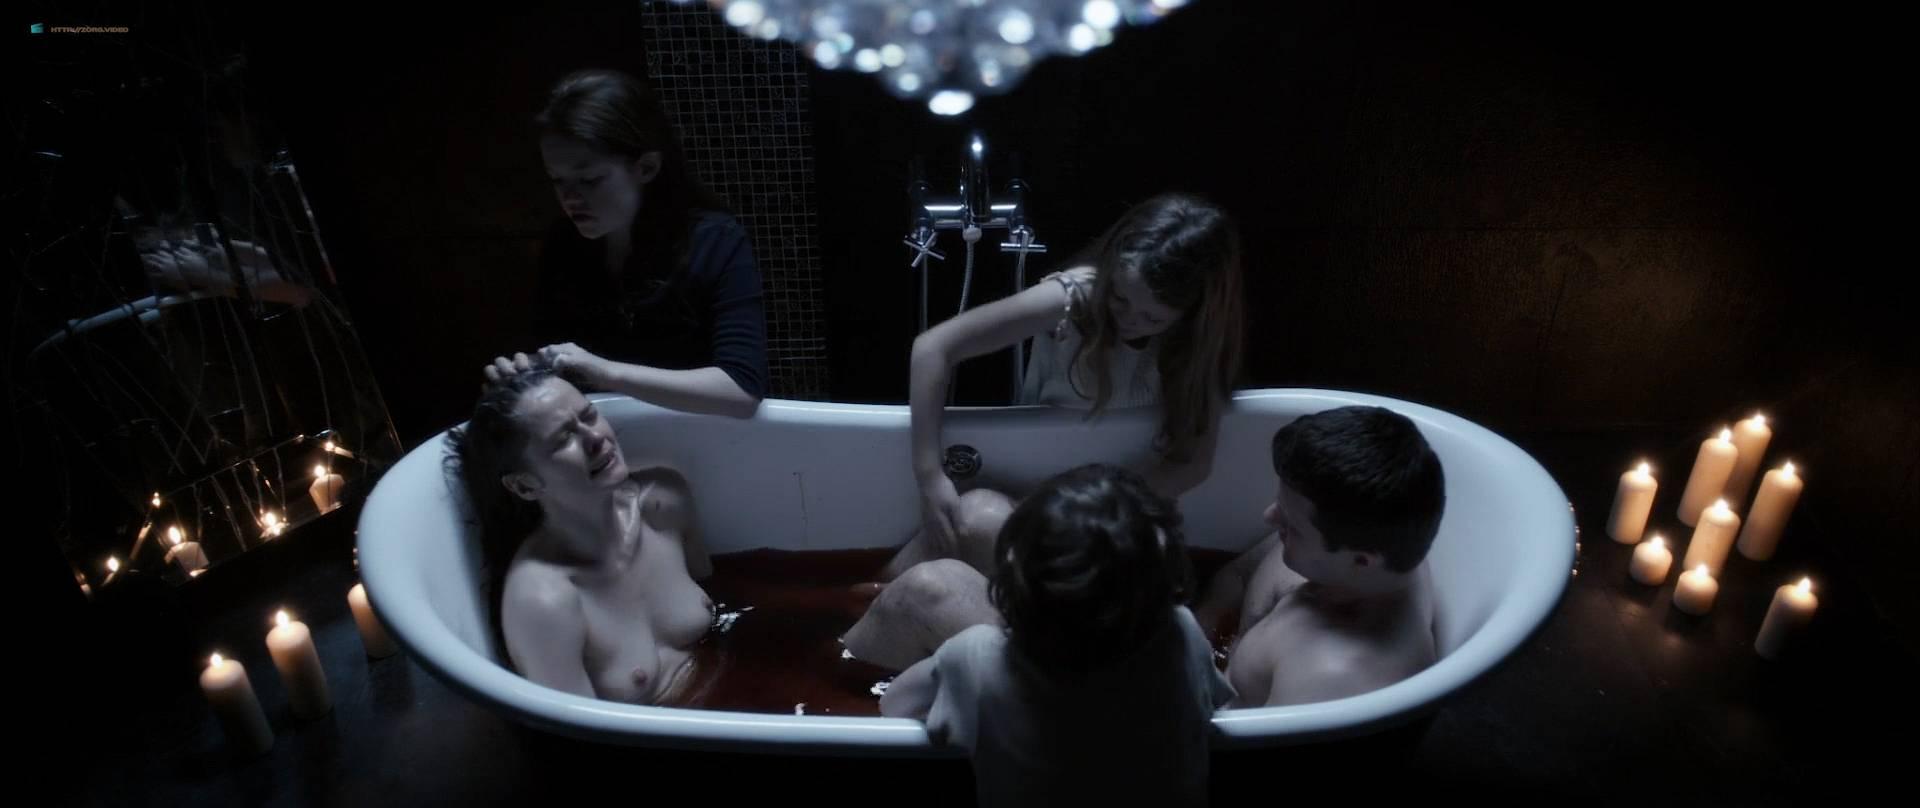 Marcella Plunkett nude topless in bath - Dark Touch (2013) HD 1080p BluRay (4)